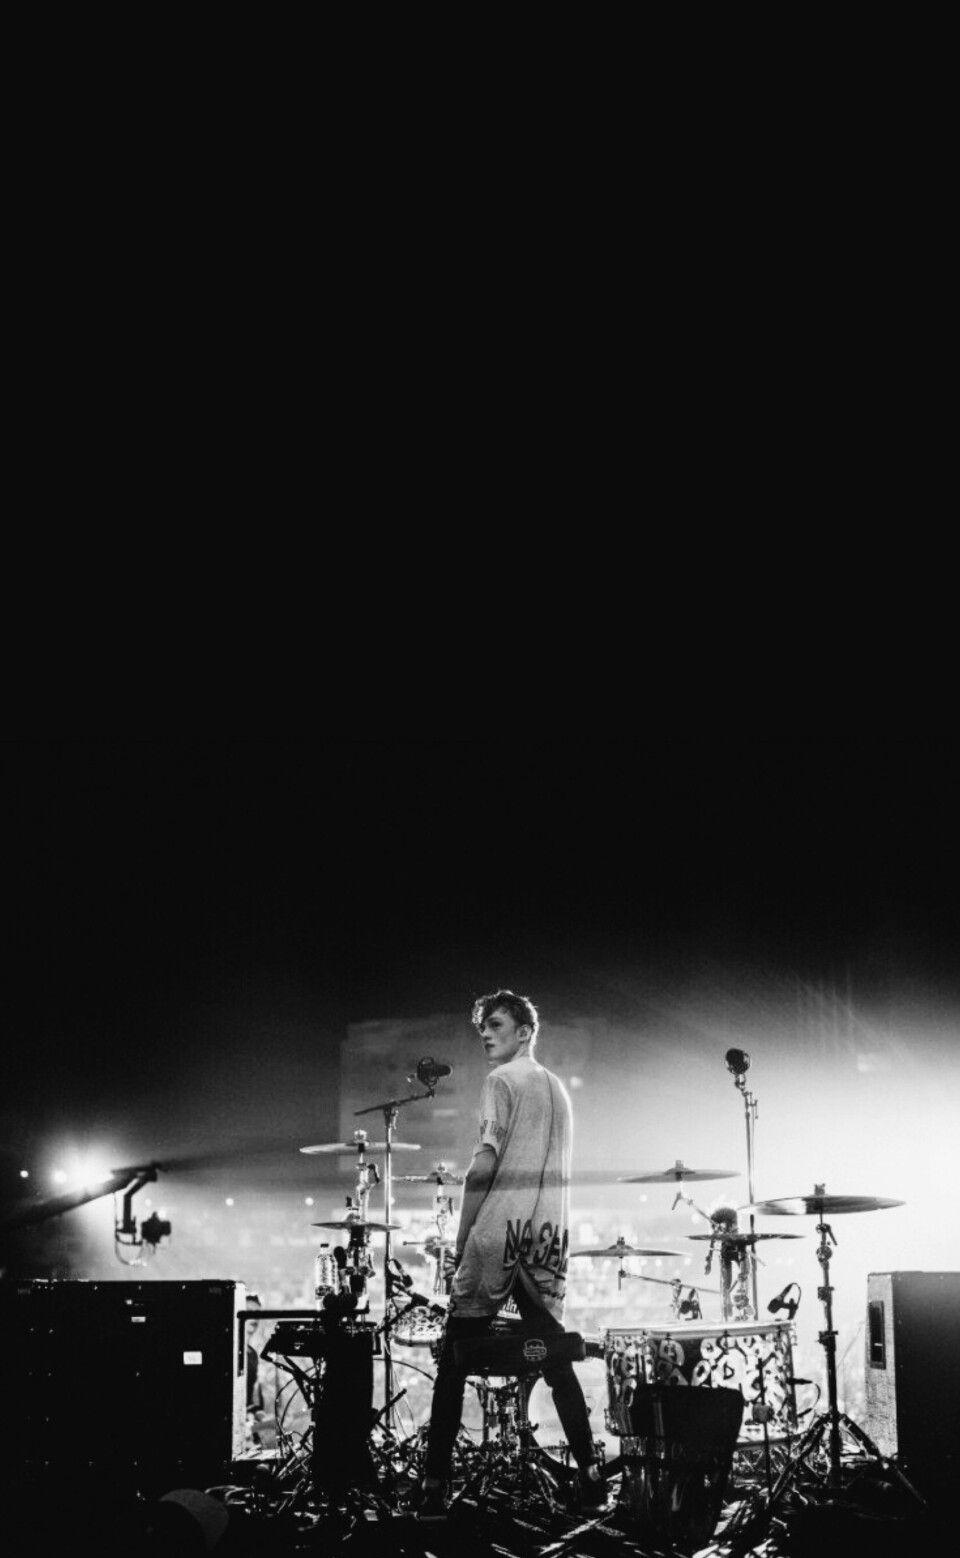 Brad Simpson Connor Ball James McVey Tristan Evans The Vamps Wallpaper Black And White